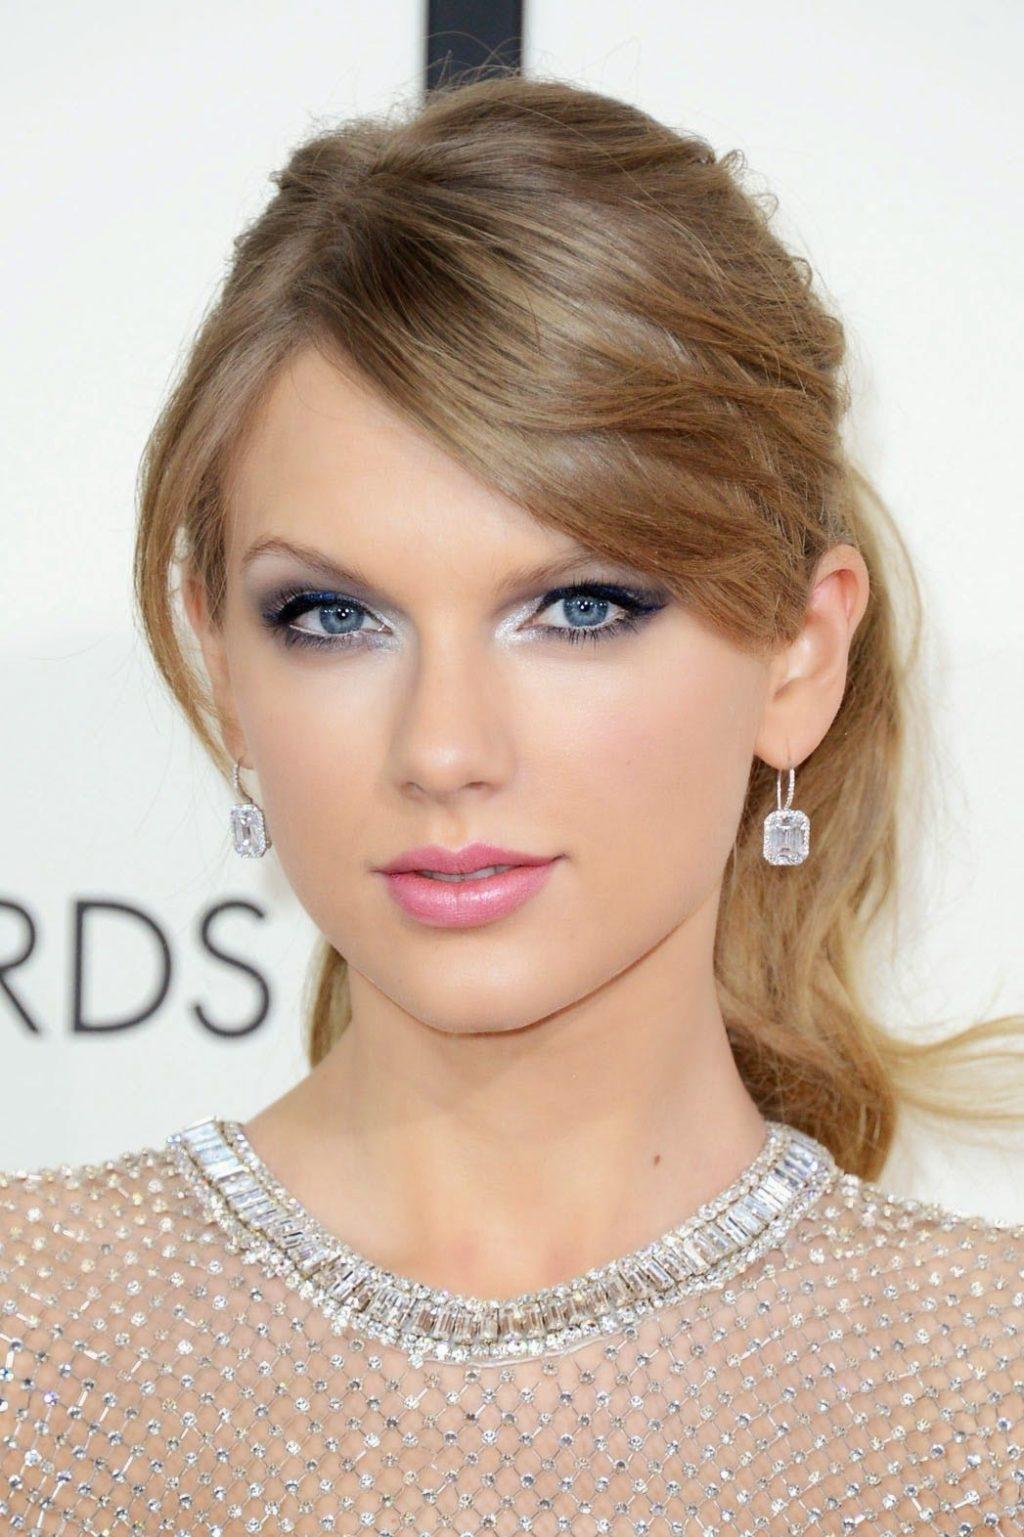 bluish-grey-smokey-eye-2-1024x1537 60+ Hottest Smokey Eye Makeup Looks in 2021